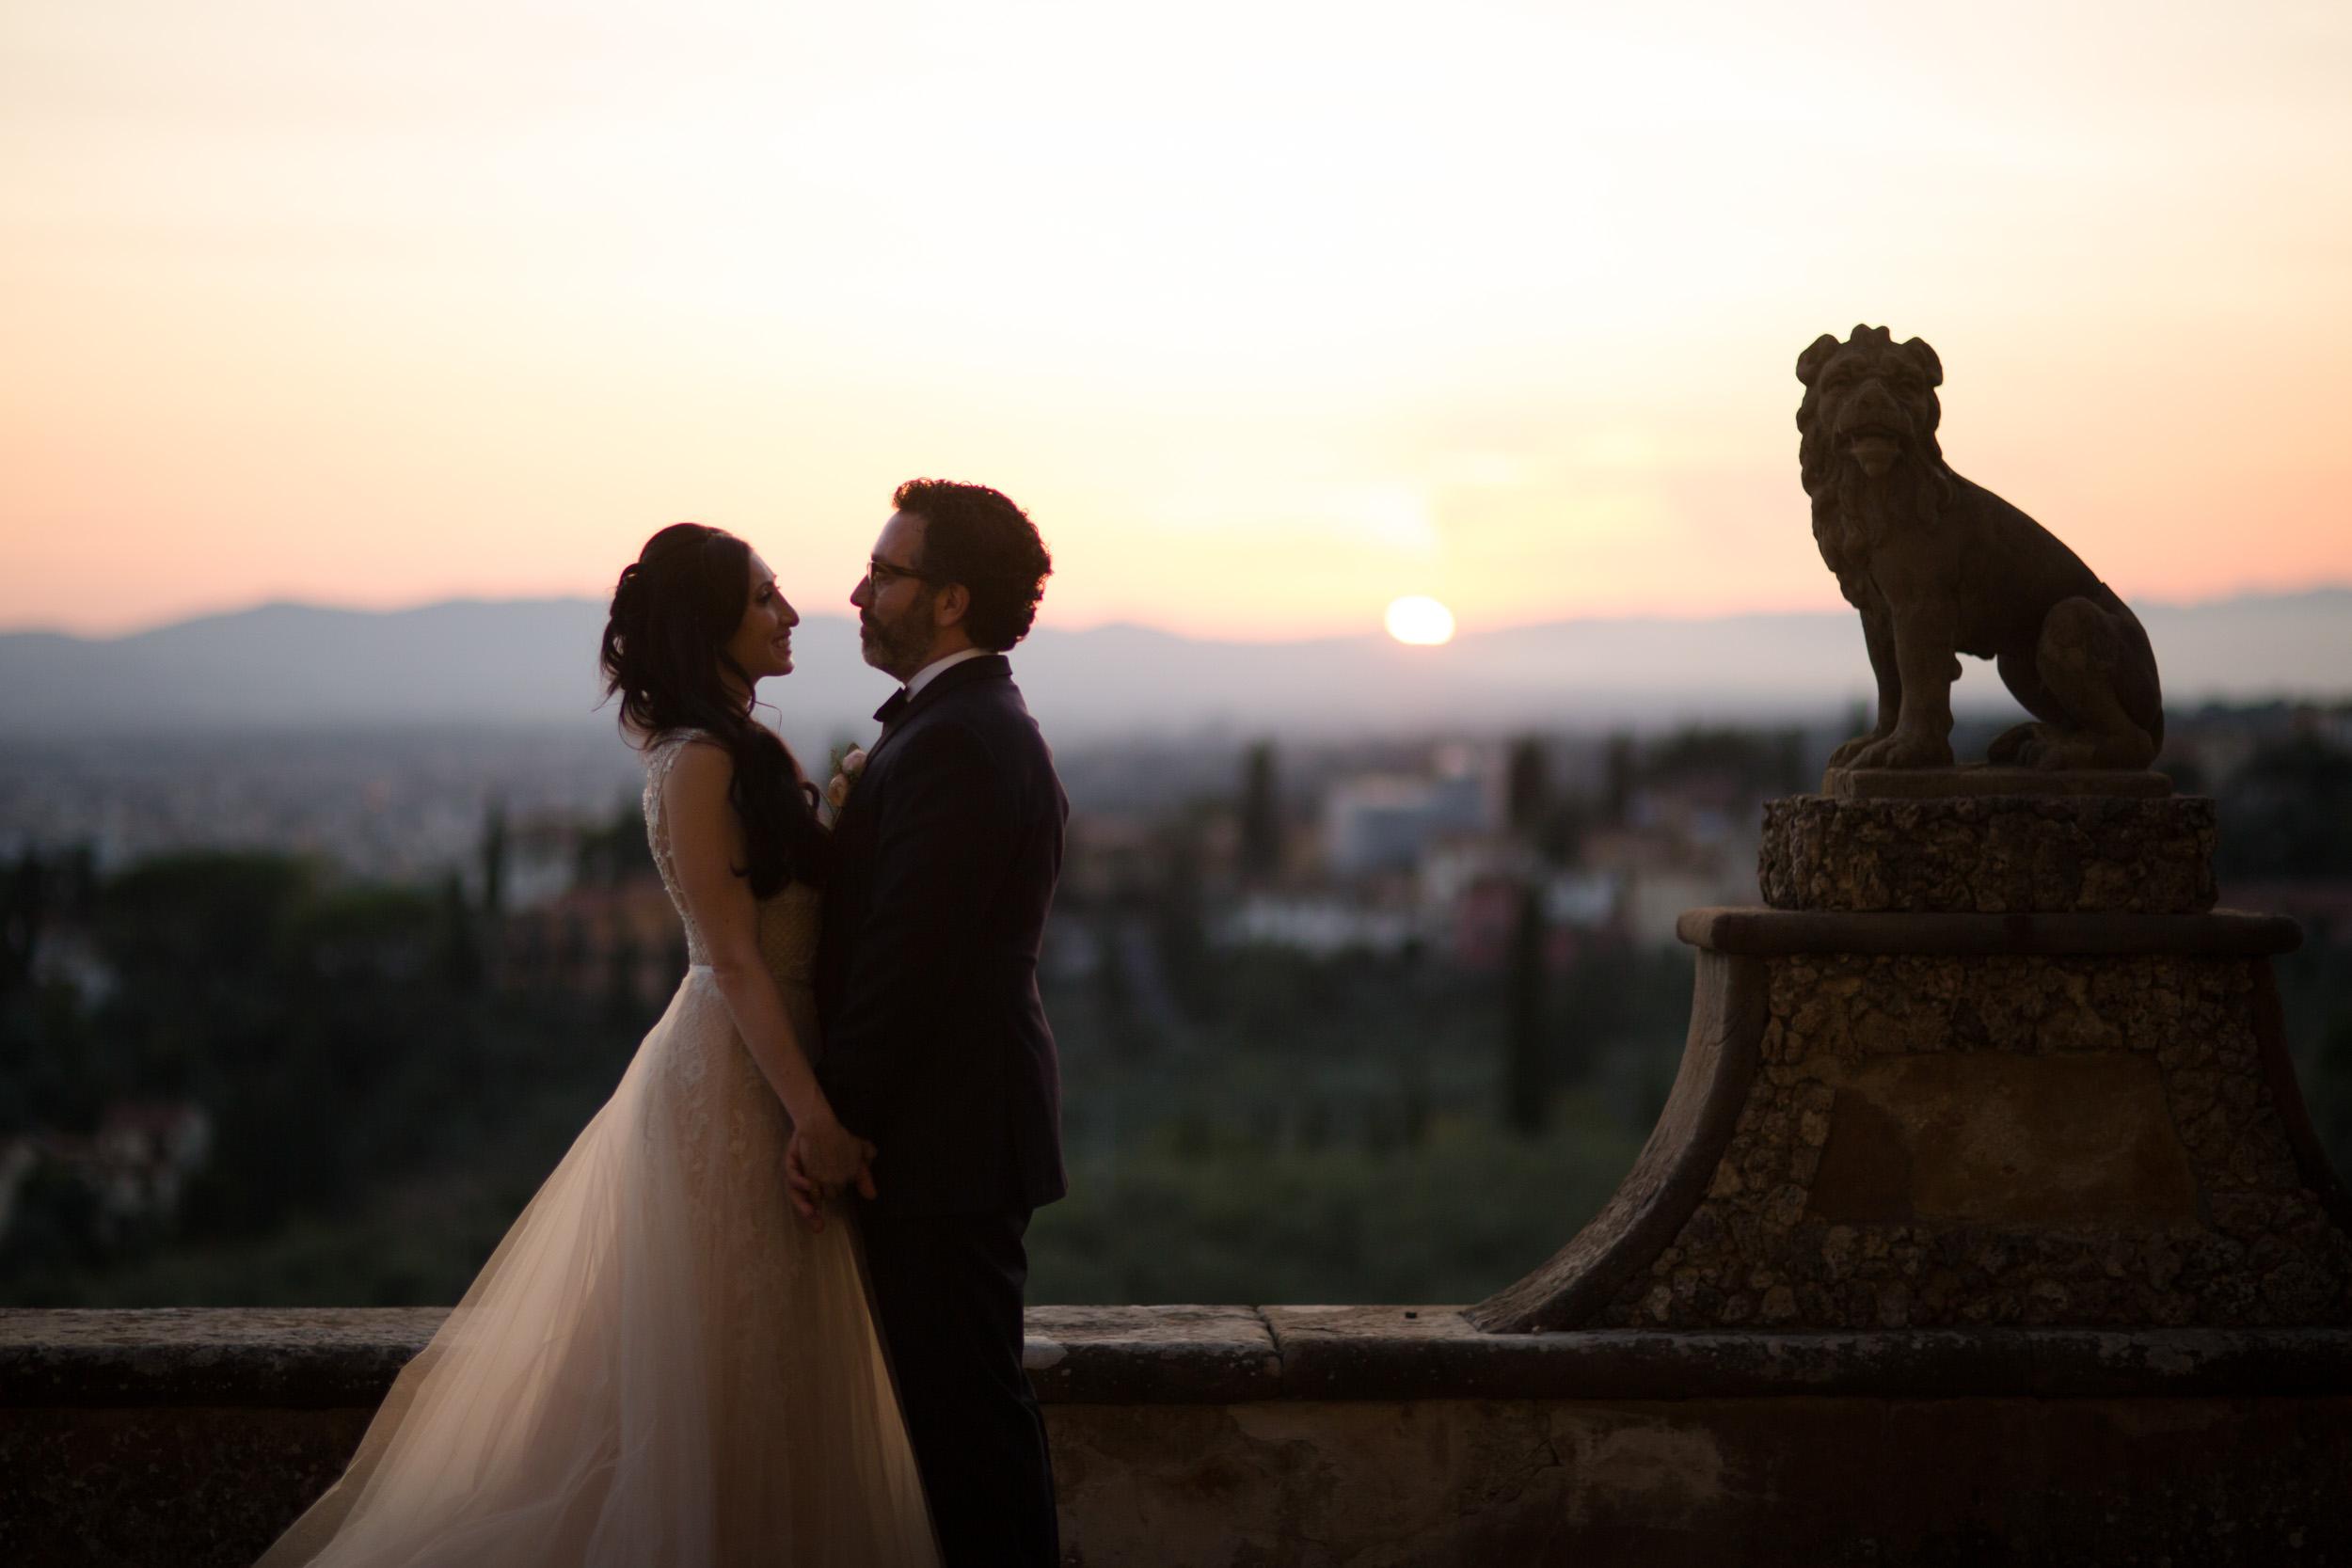 villa-gamberaia-florence-italy-destination-wedding-69.jpg